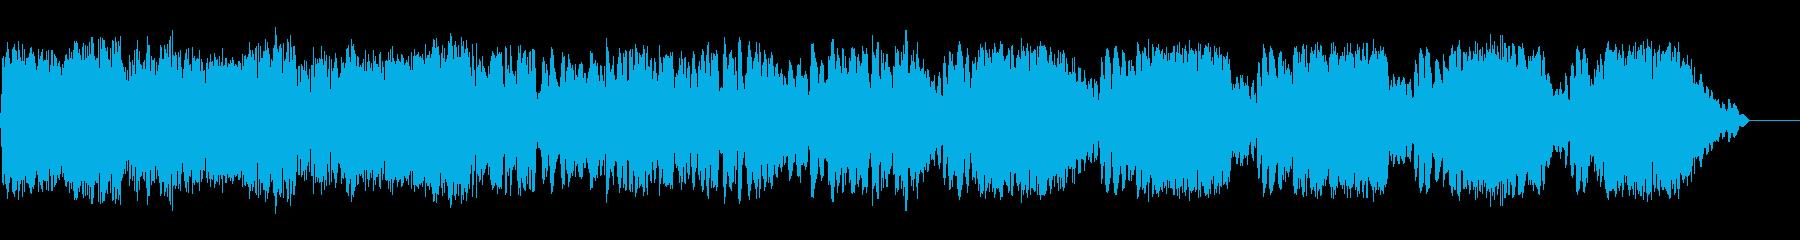 Swishy Bump Burstの再生済みの波形